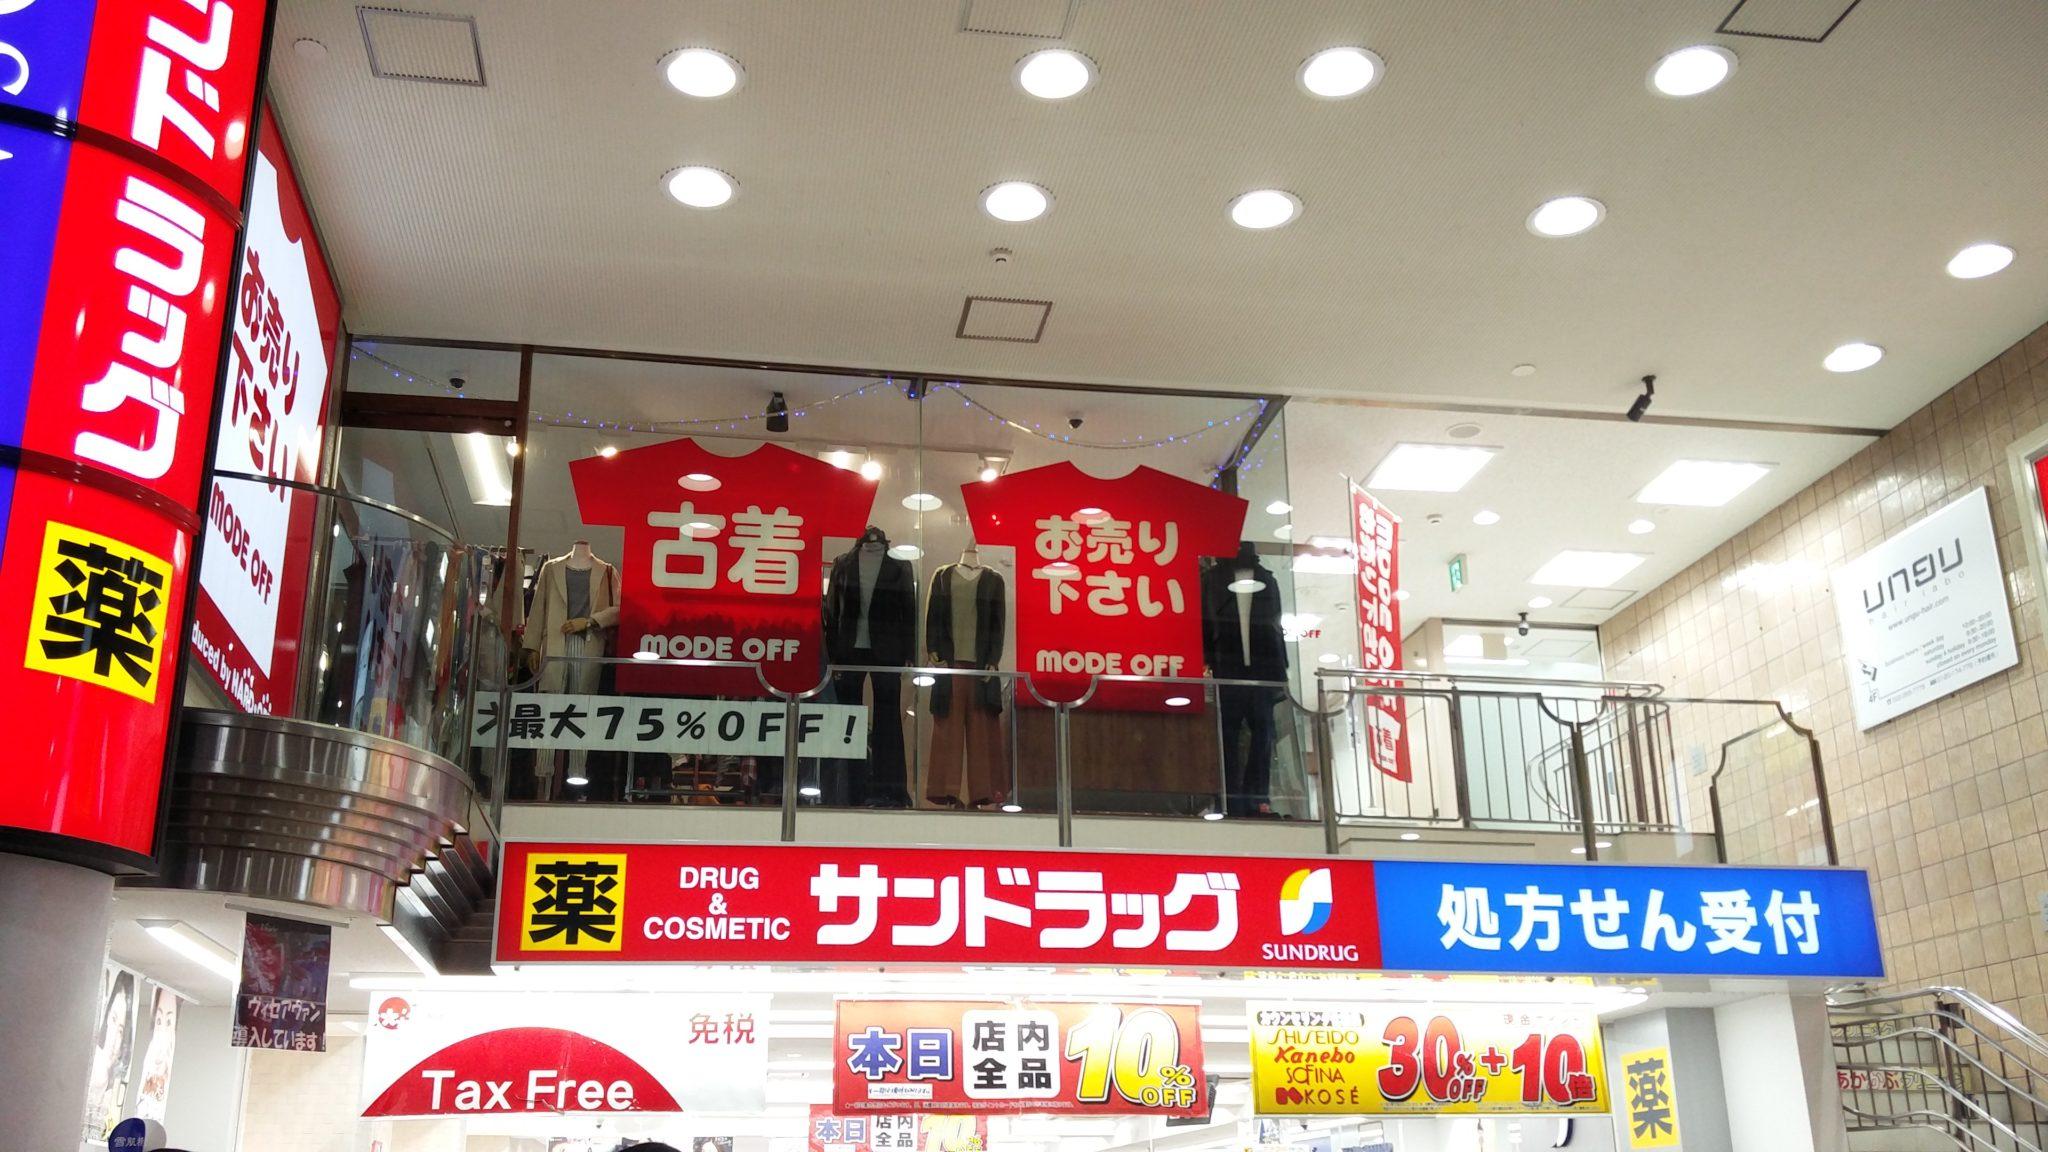 Mode off in Sendai